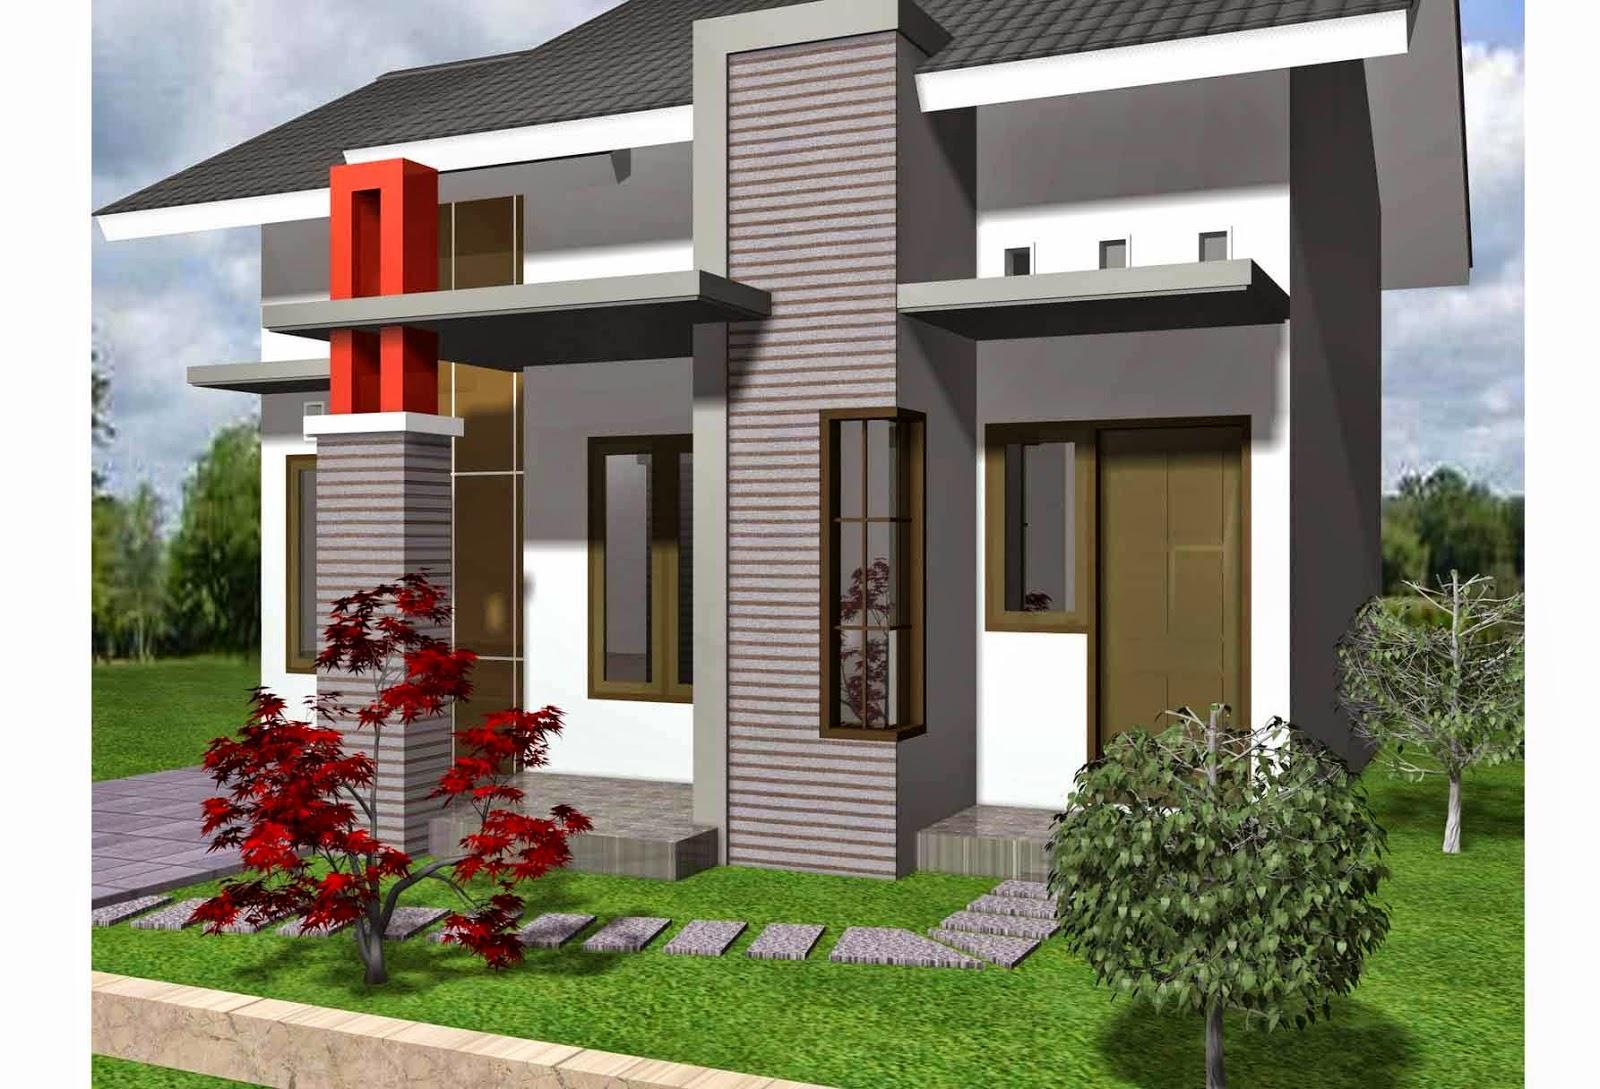 rumah minimalis modern satu lantai dilahan luas maupun